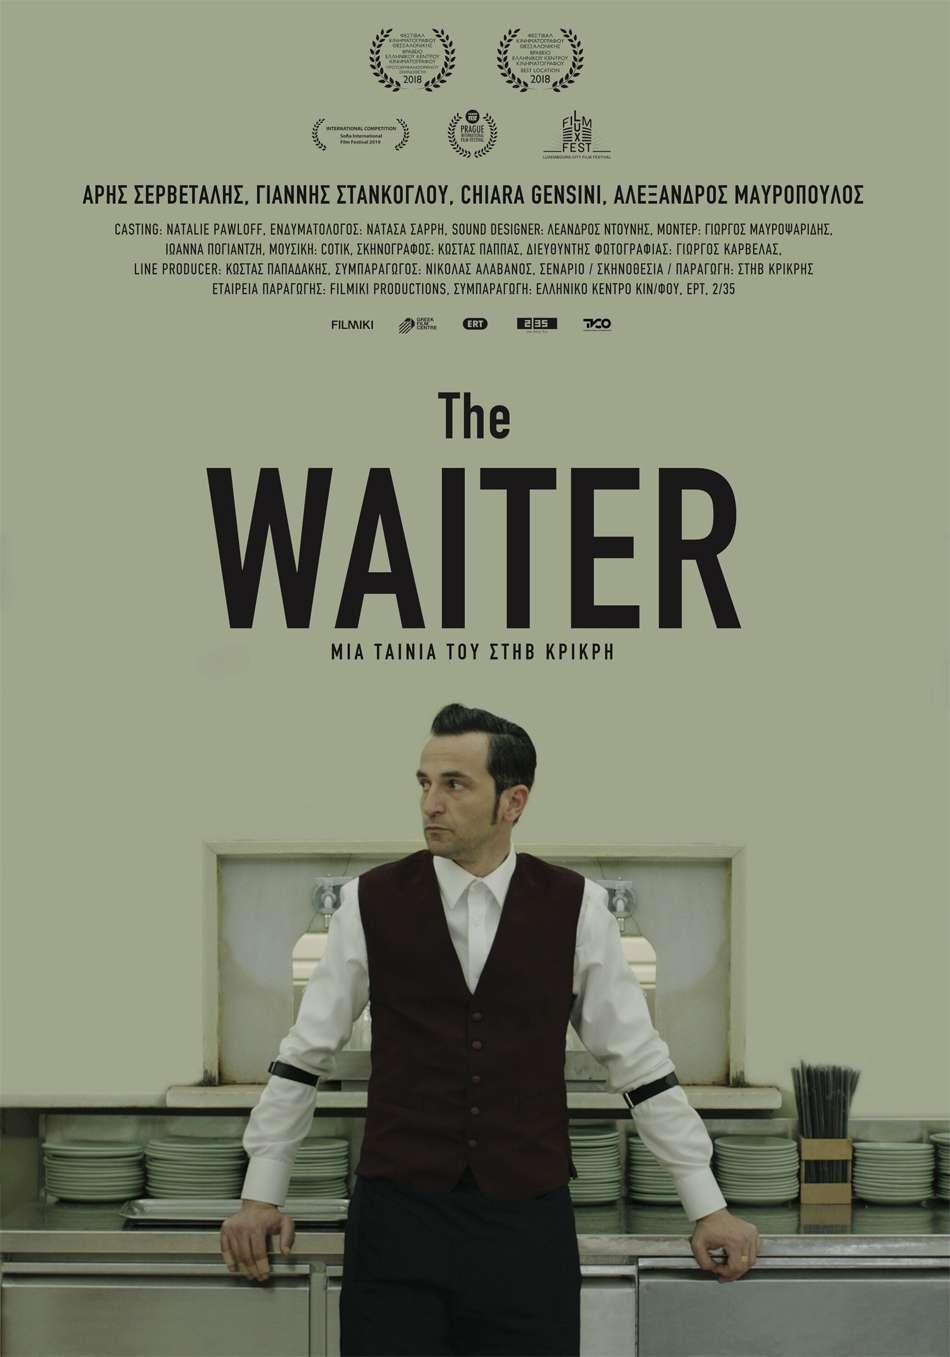 The Waiter Poster Πόστερ